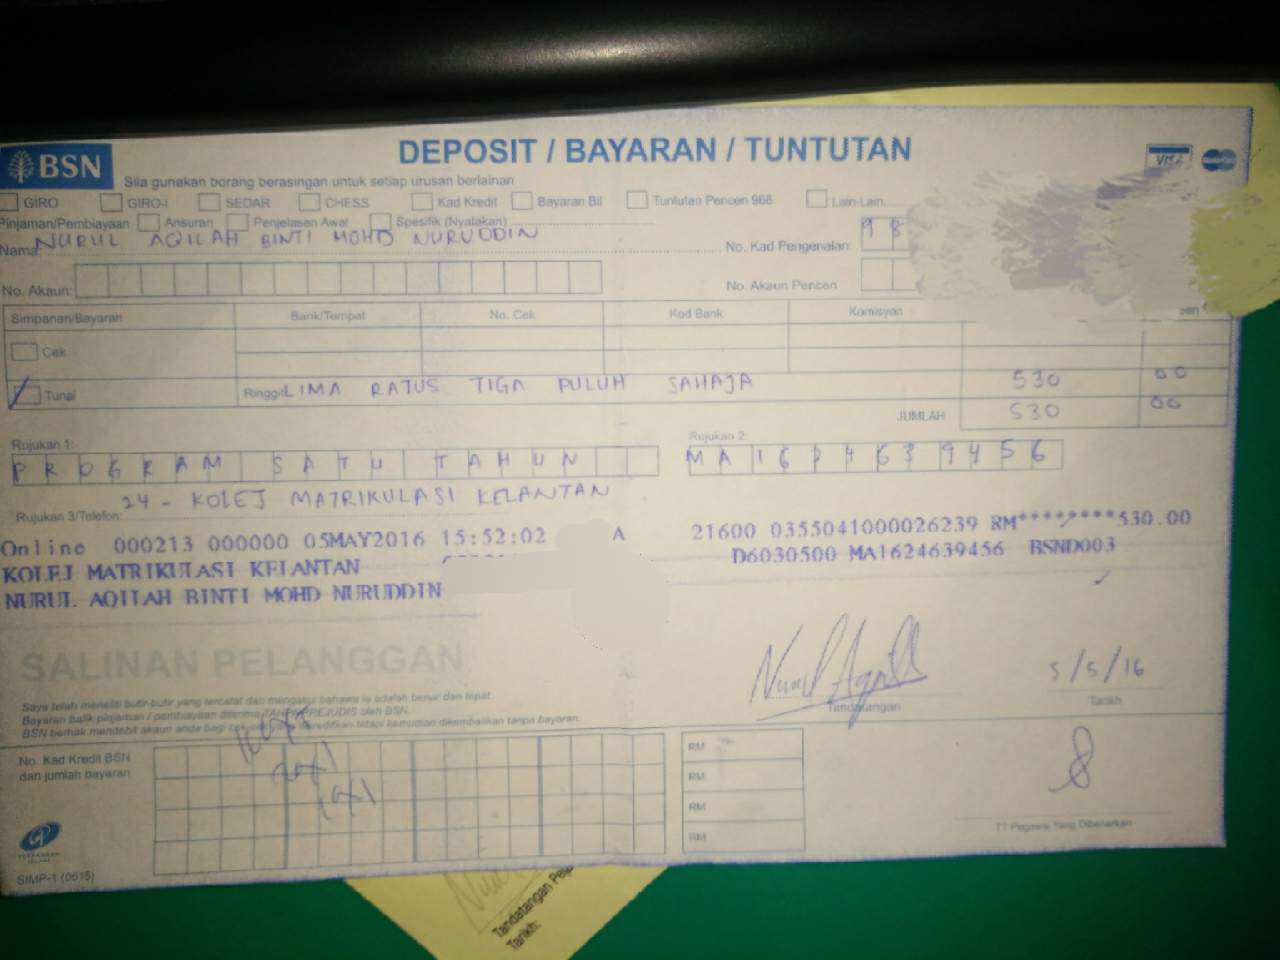 Cerita Si Aqilah Kolej Matrikulasi Kelantan